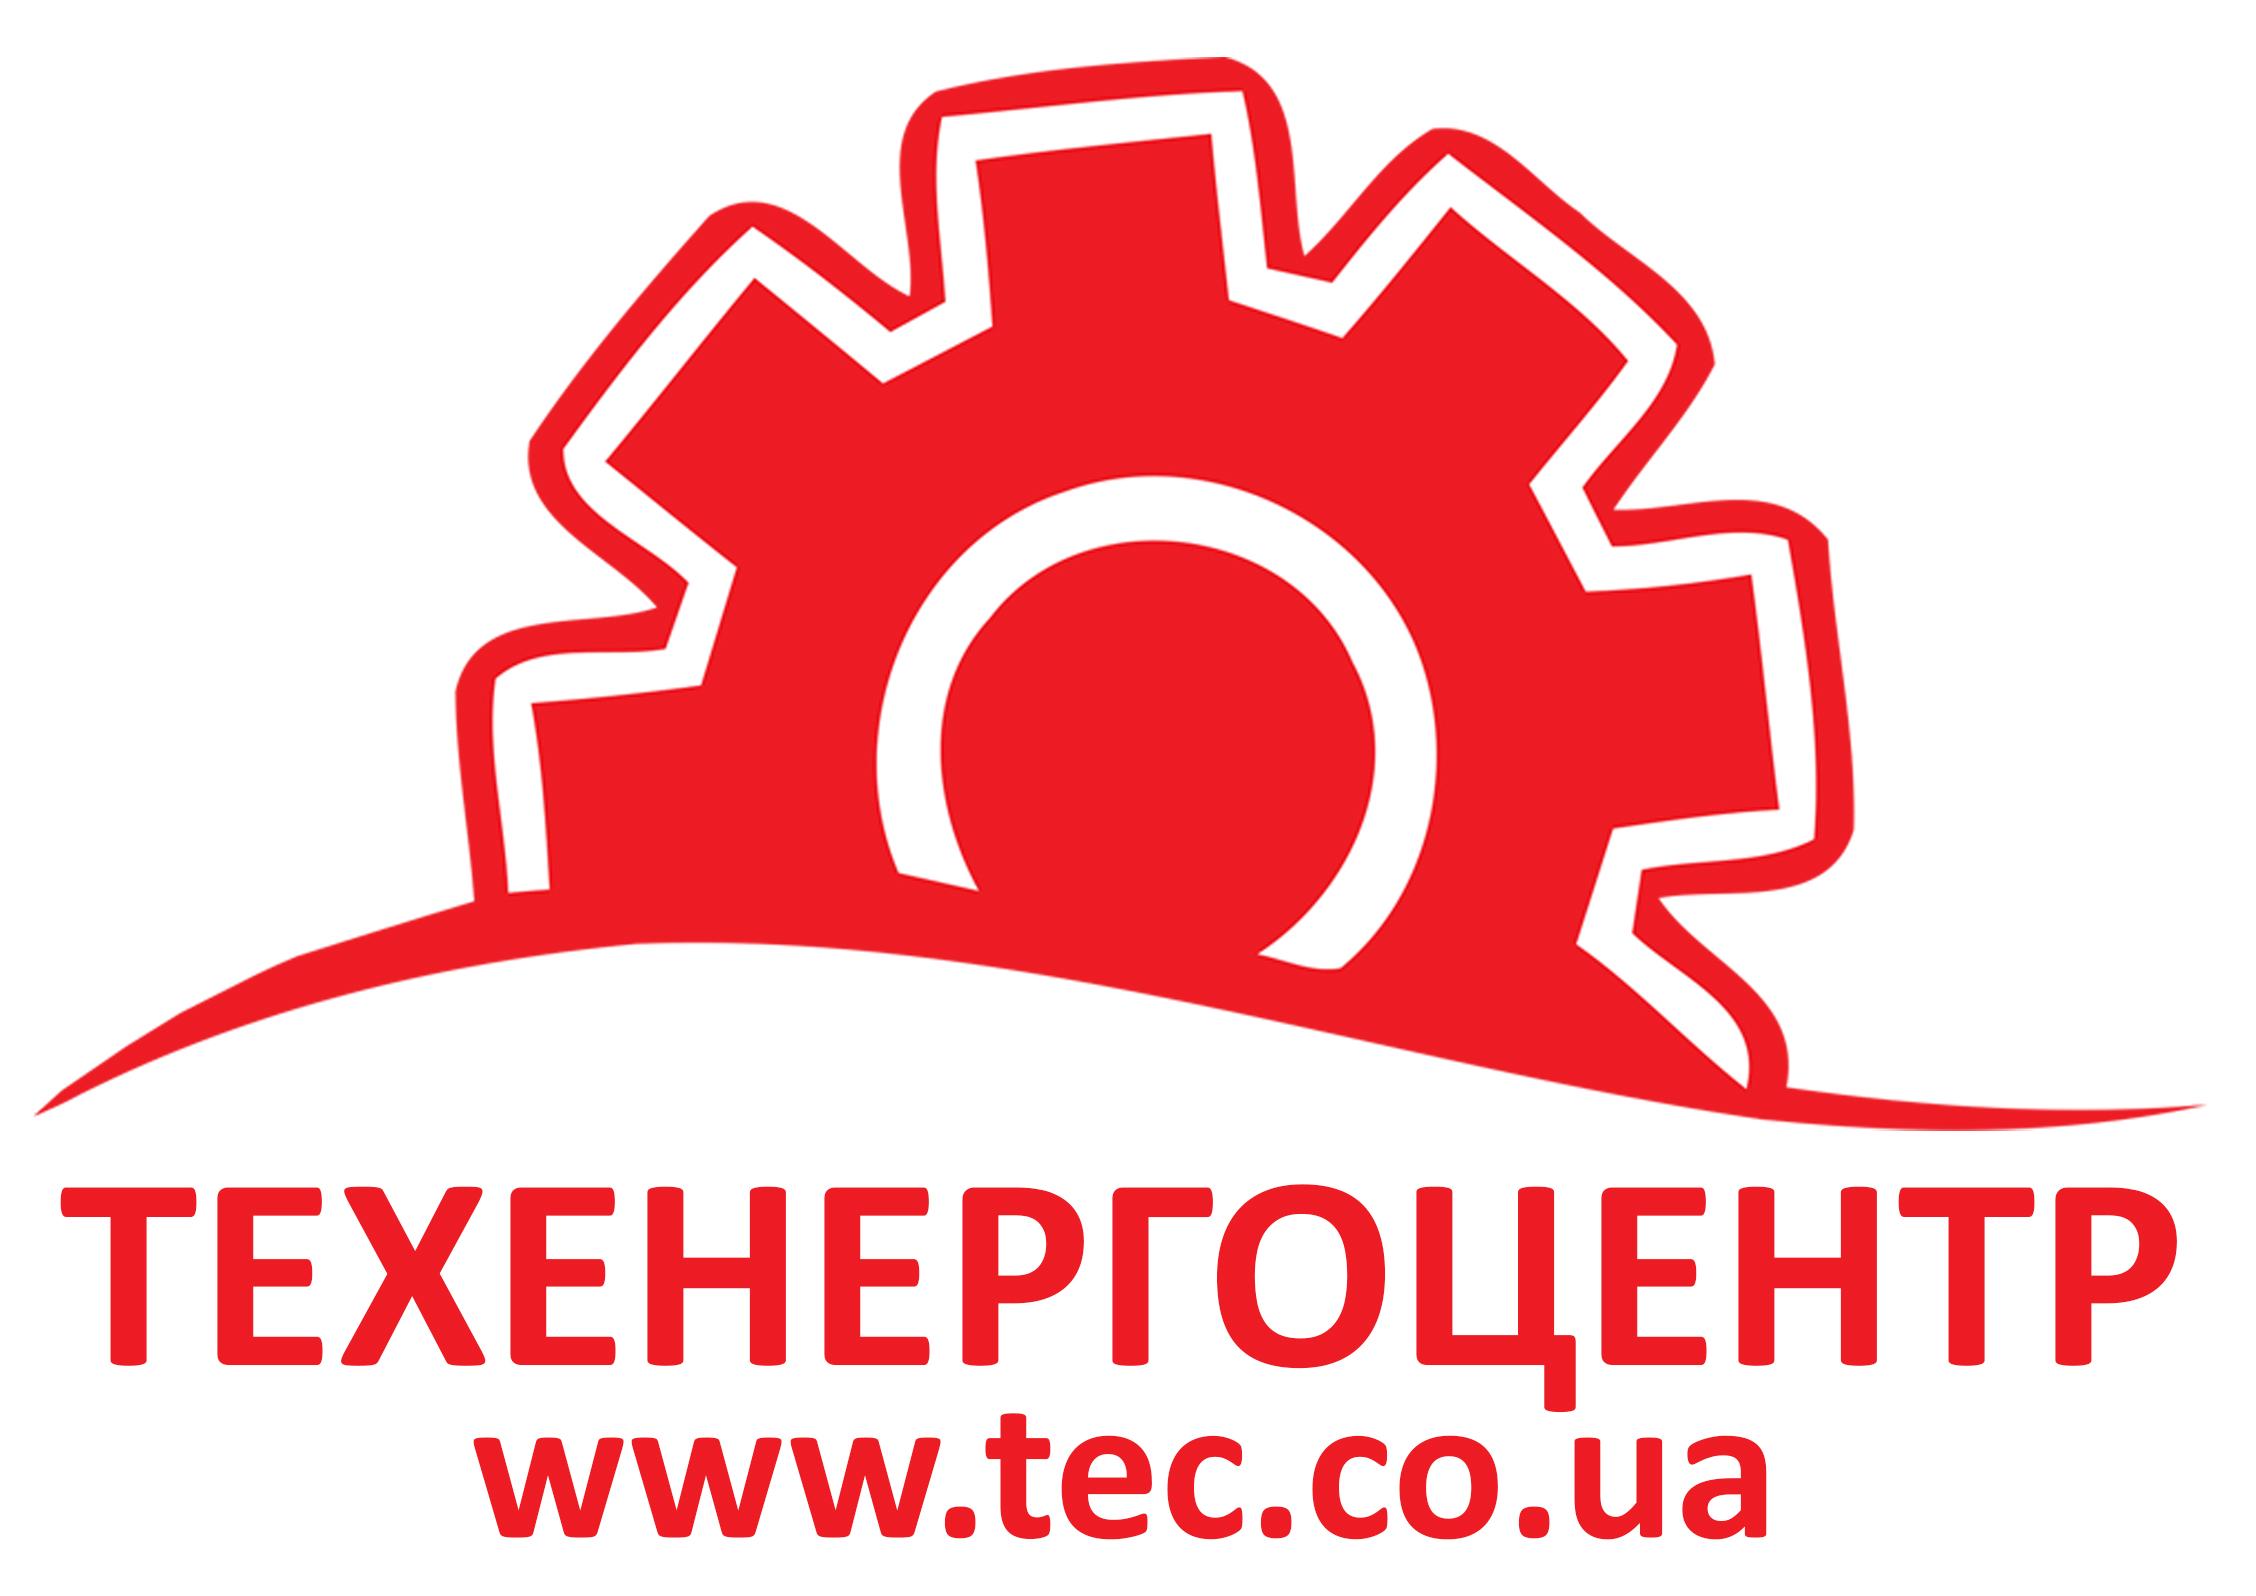 Техэнергоцентр, ООО